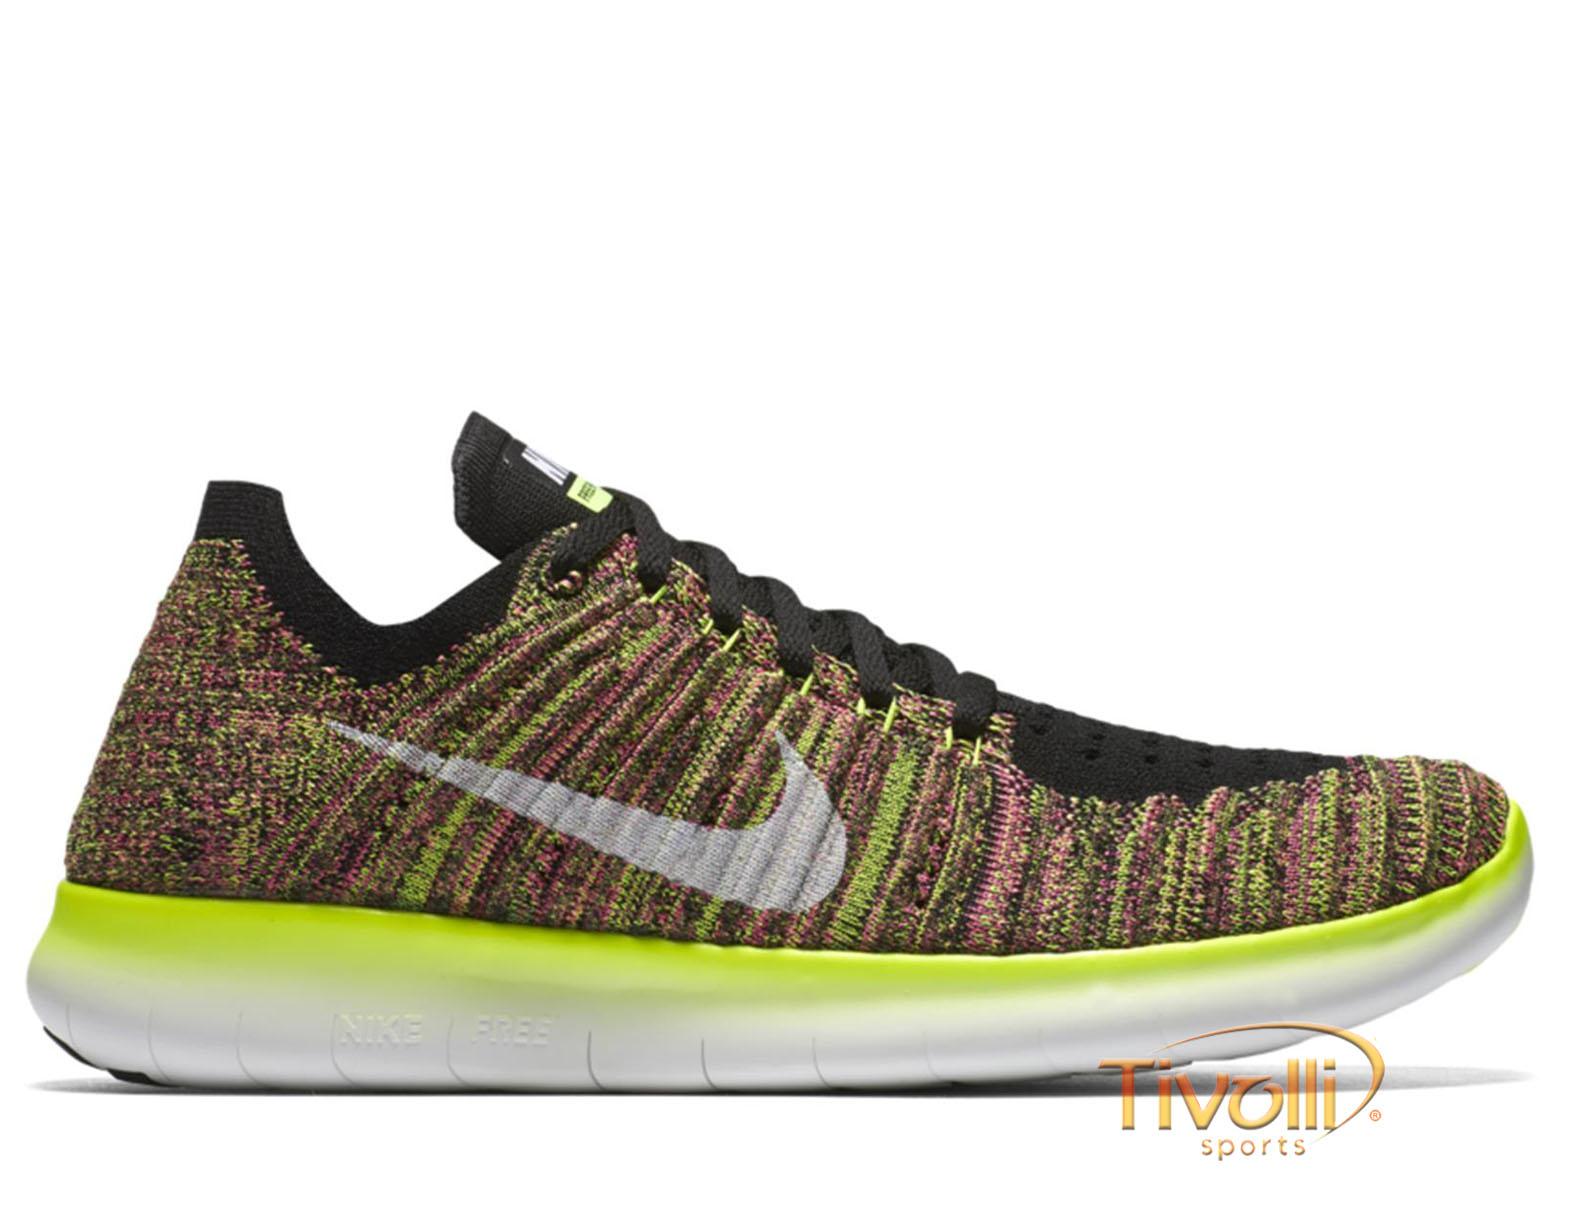 1ee26360bc7 Tênis Nike WMNS Free RN Flyknit OC   multicor